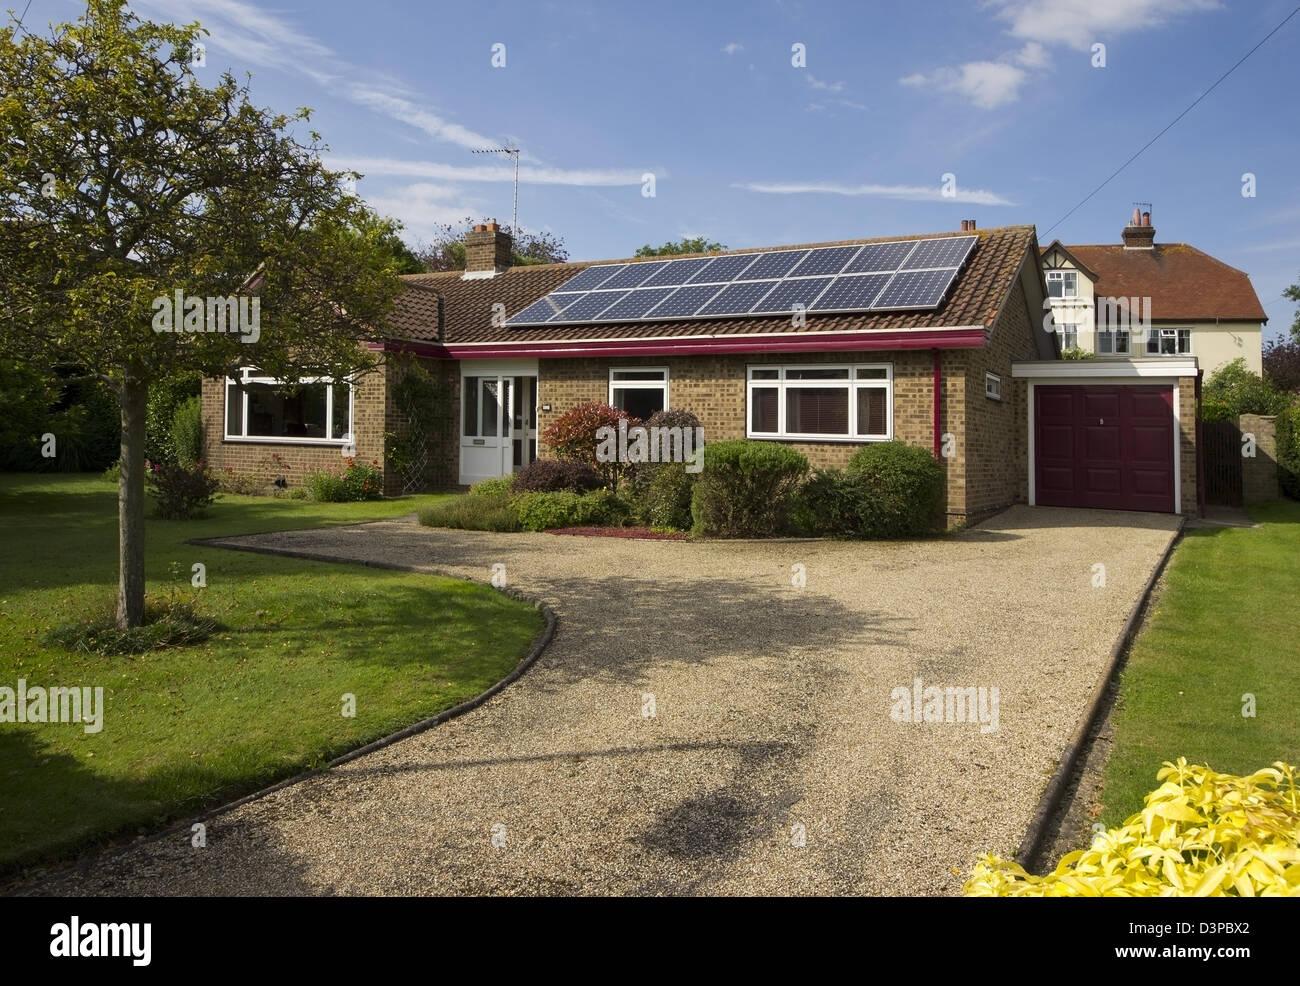 Matriz de 16 paneles solares en bungalow Imagen De Stock